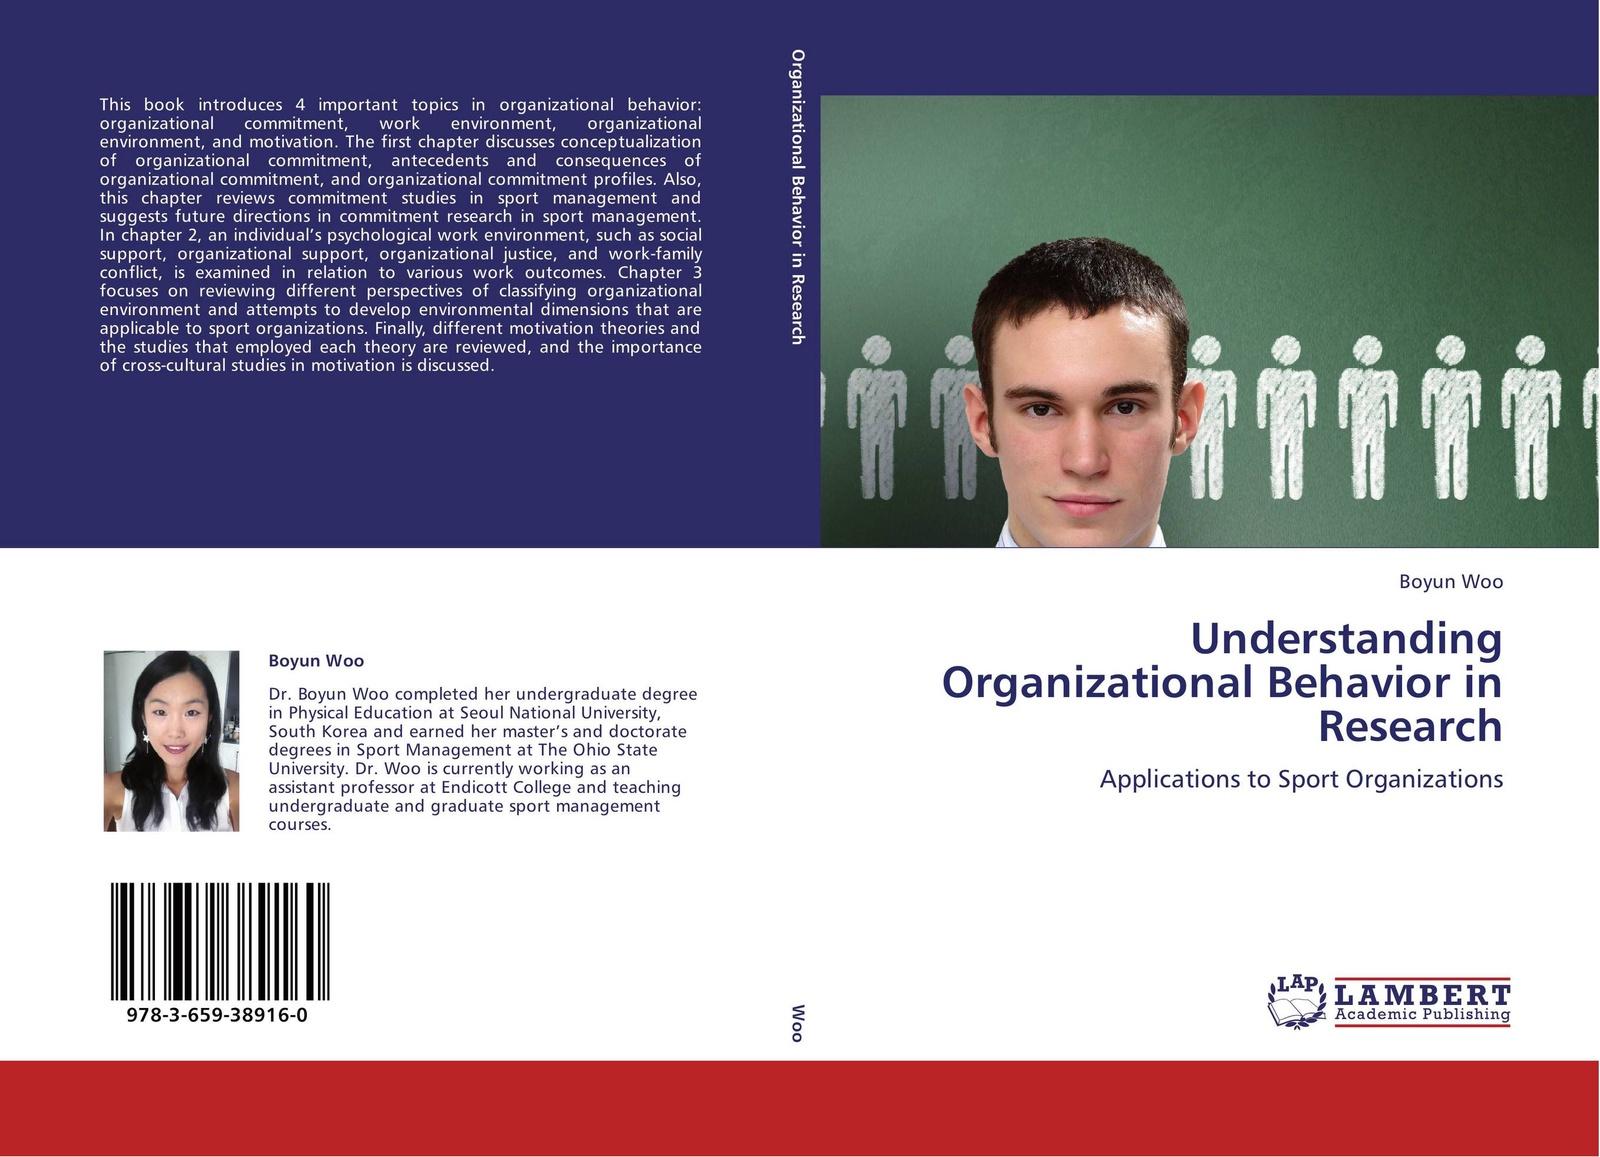 Boyun Woo Understanding Organizational Behavior in Research employeeship and organizational excellence